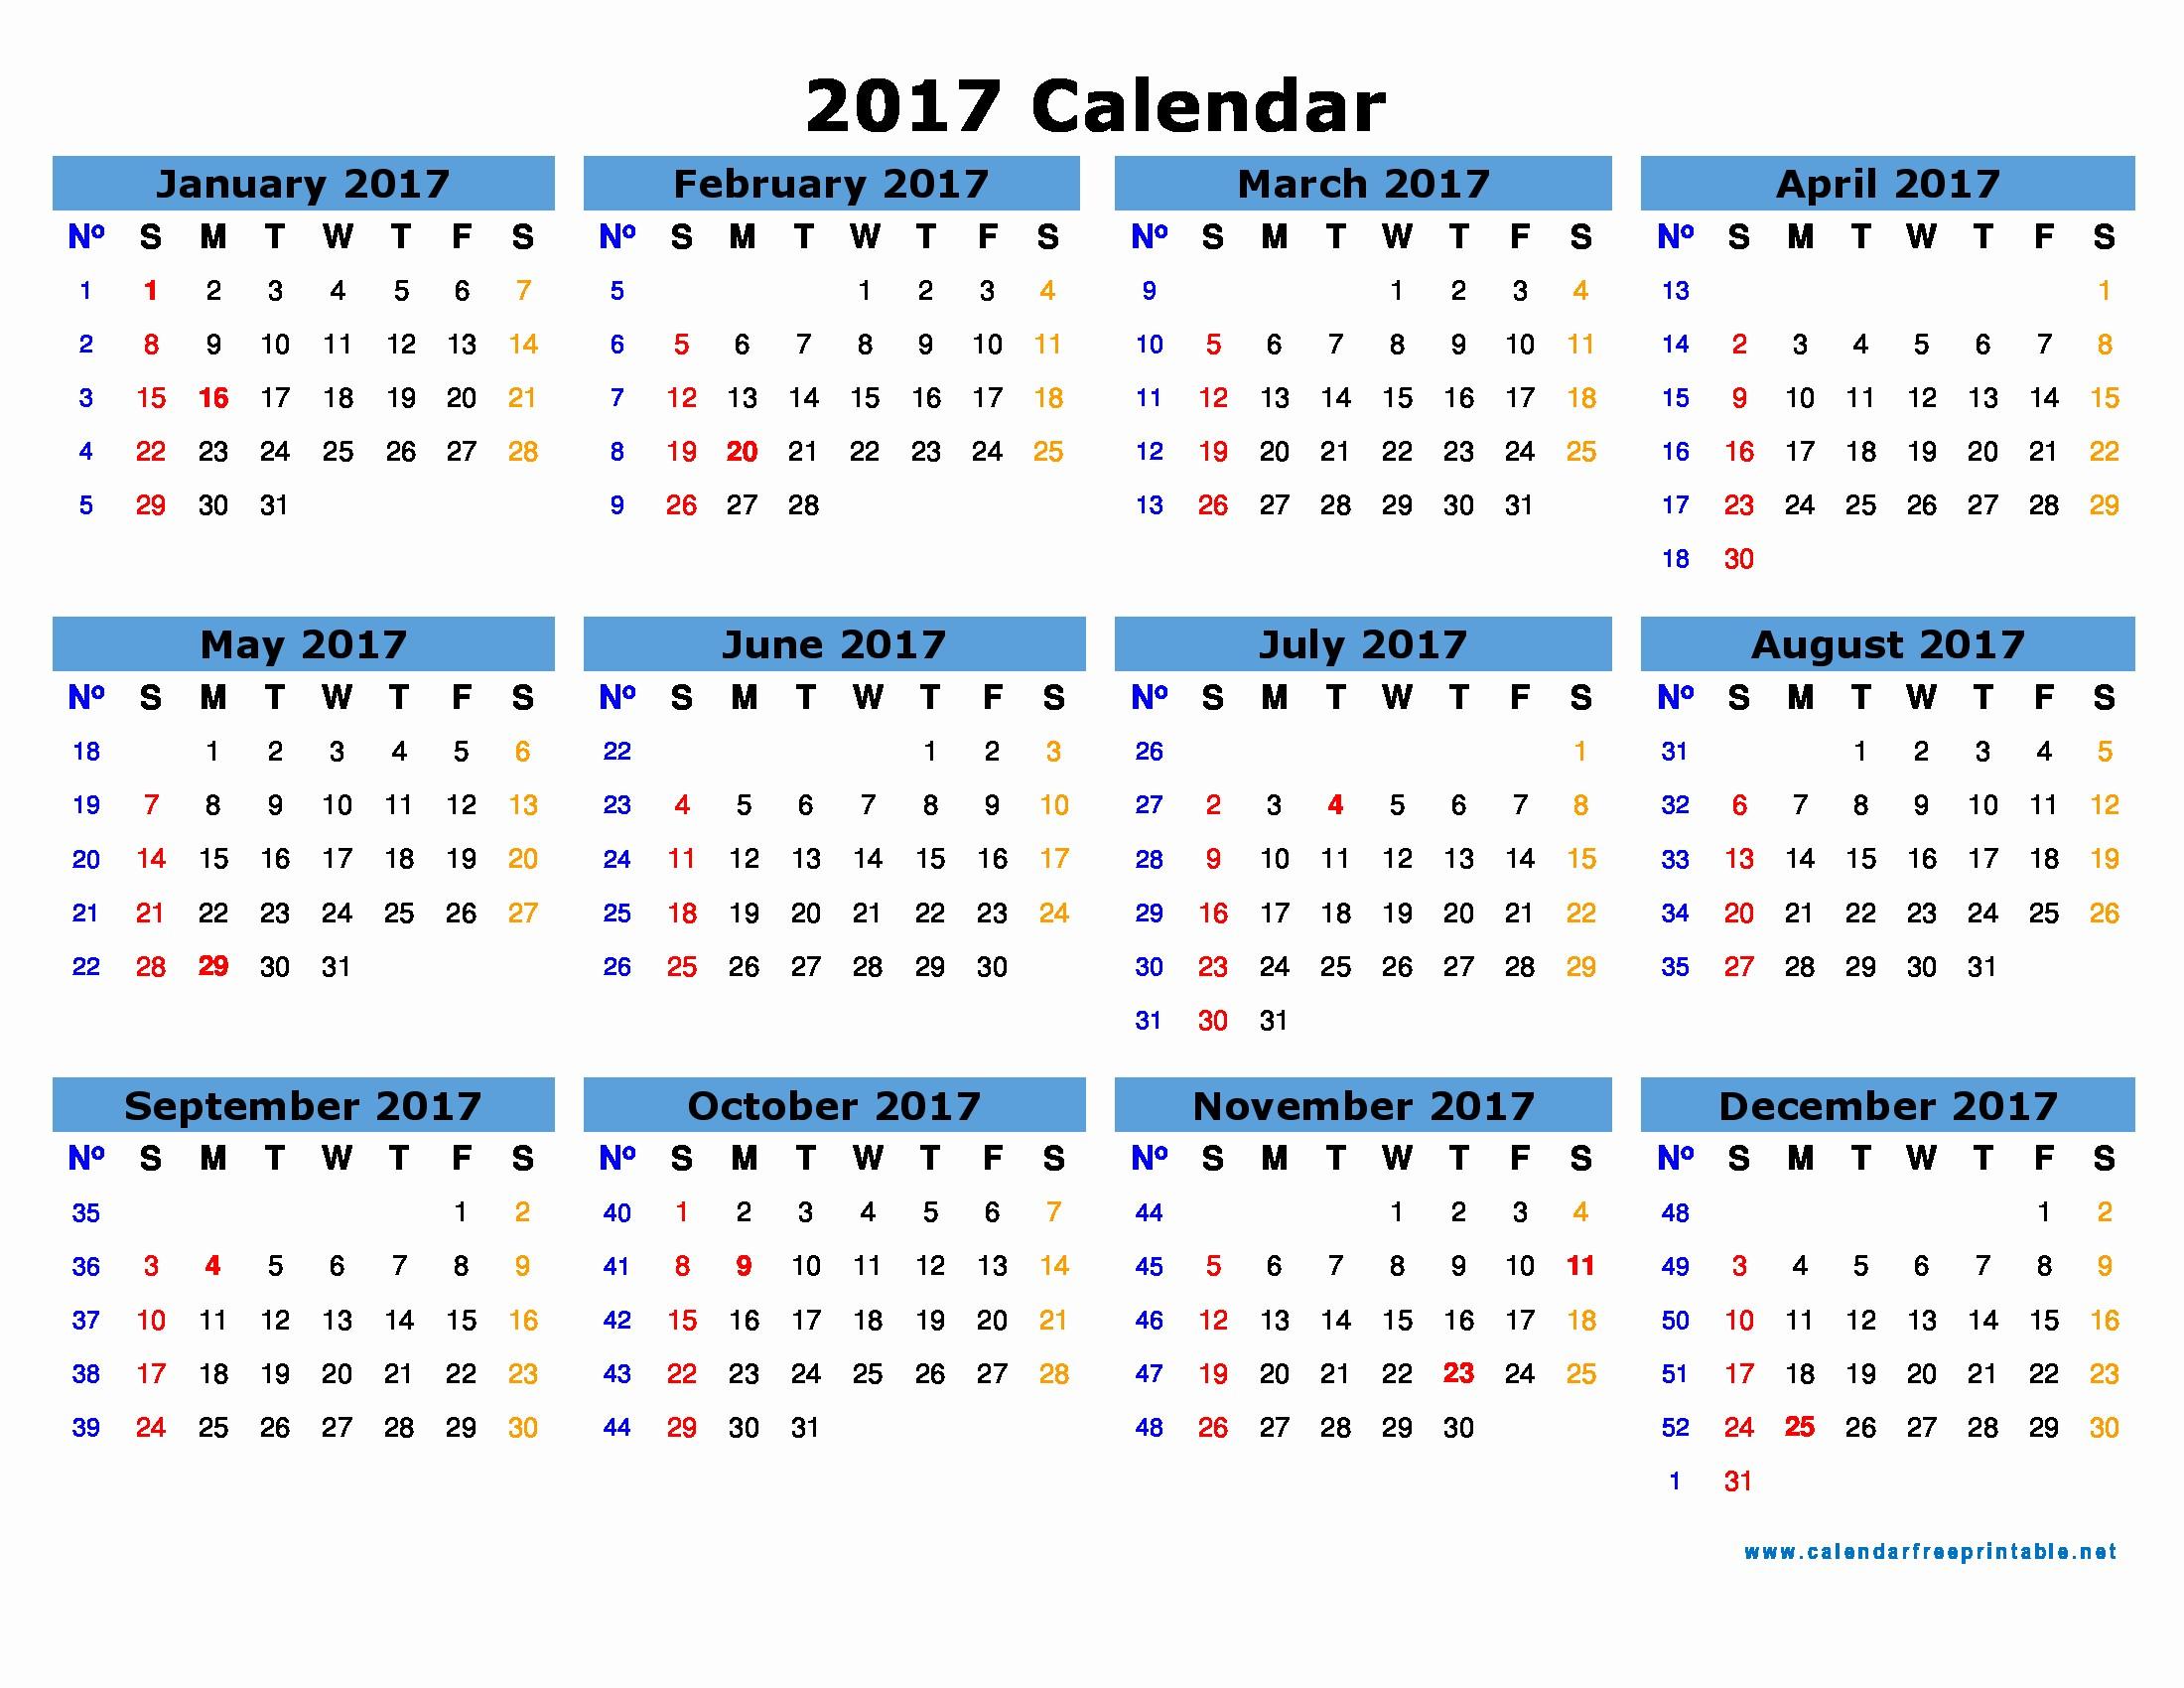 2017 Year Calendar Printable Free Elegant Free 2017 Calendar with Holidays